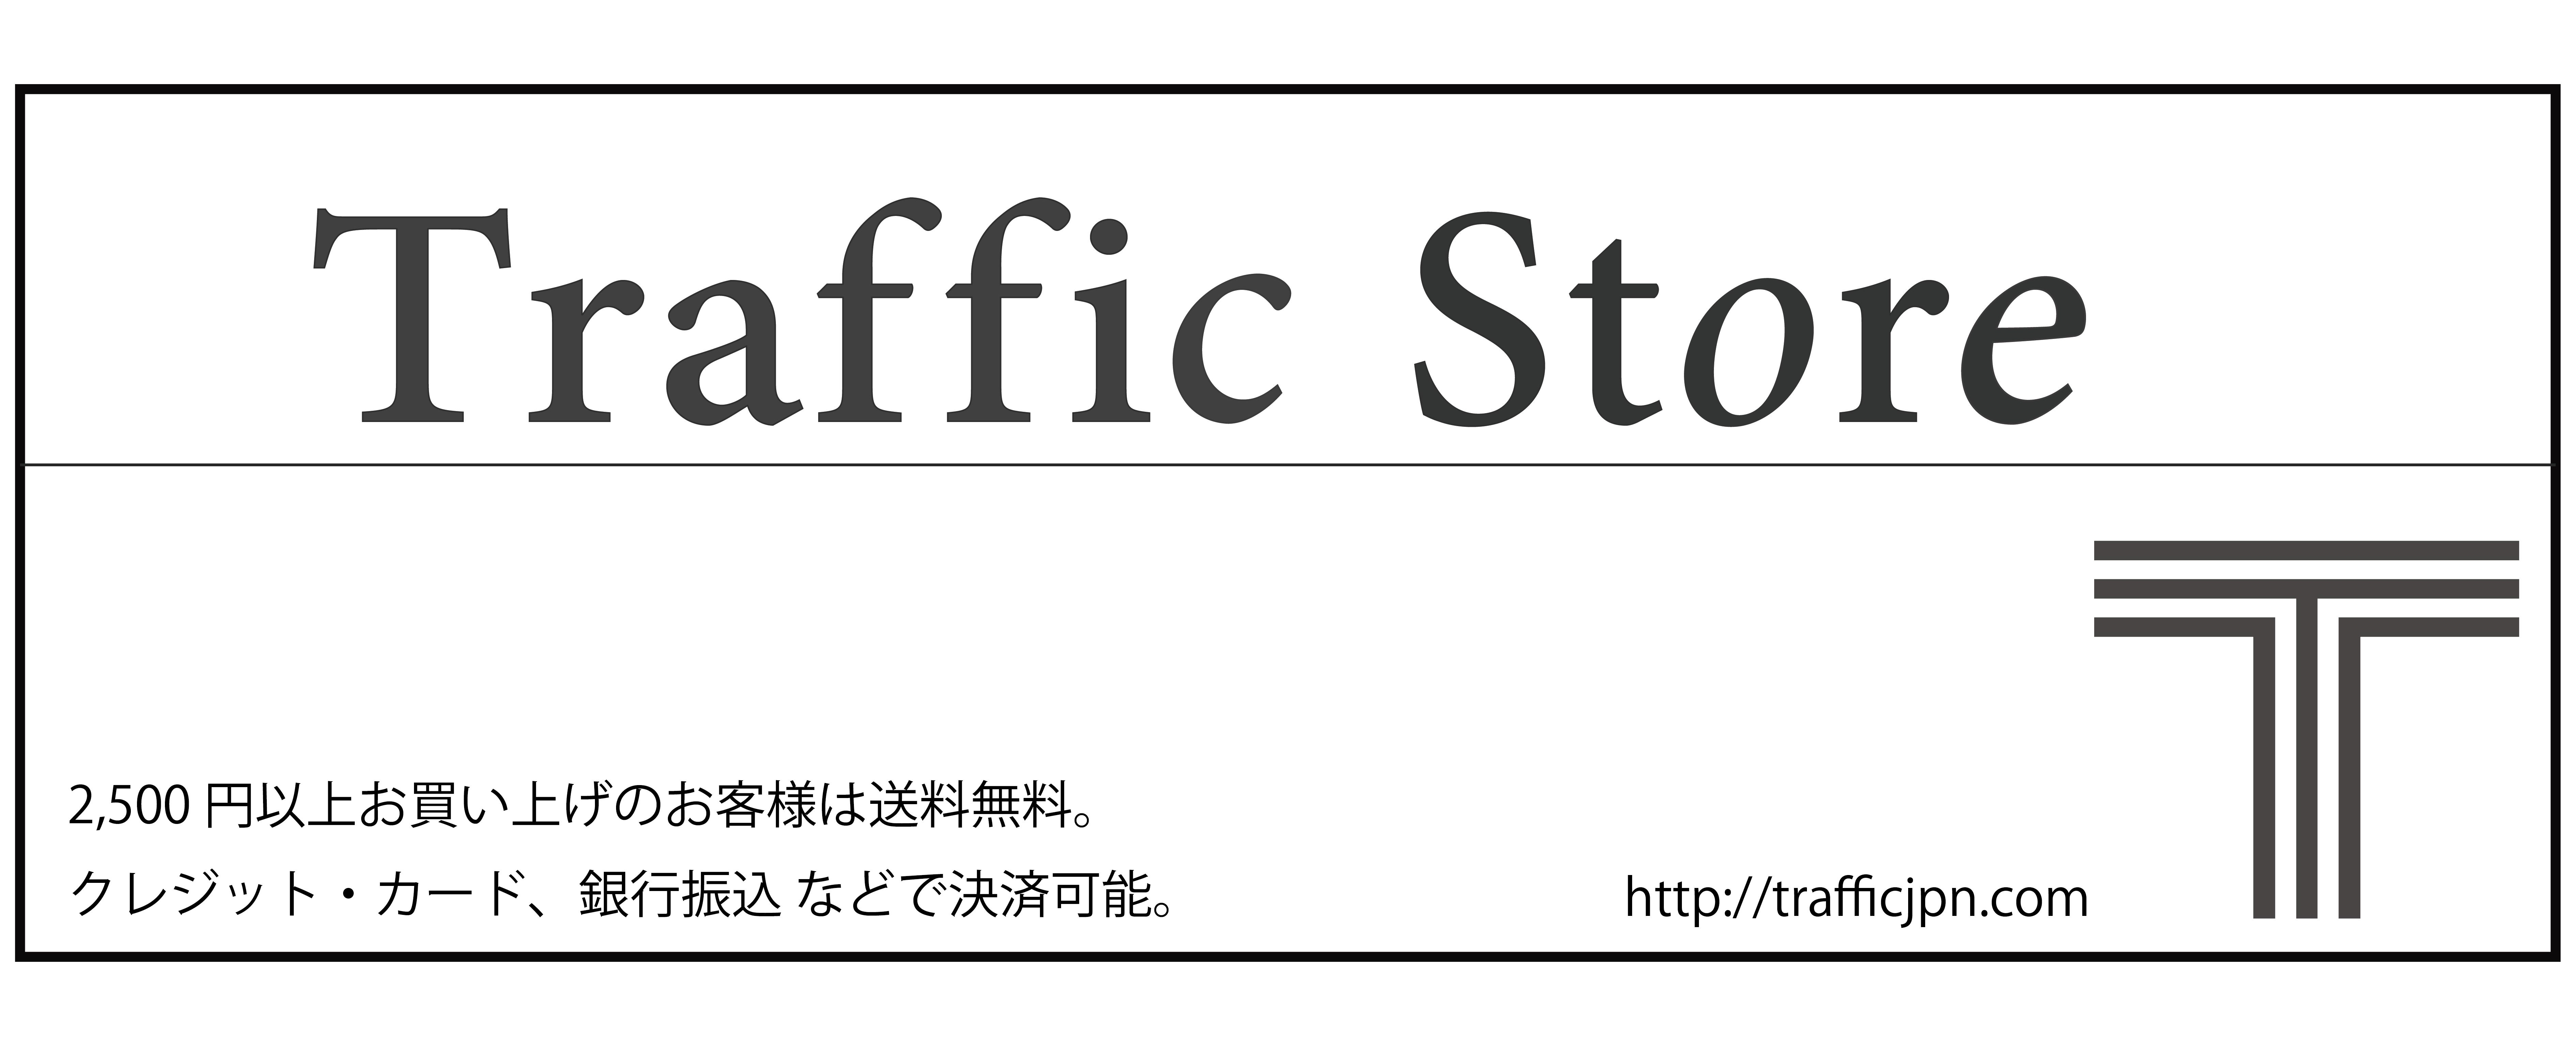 Traffic Store